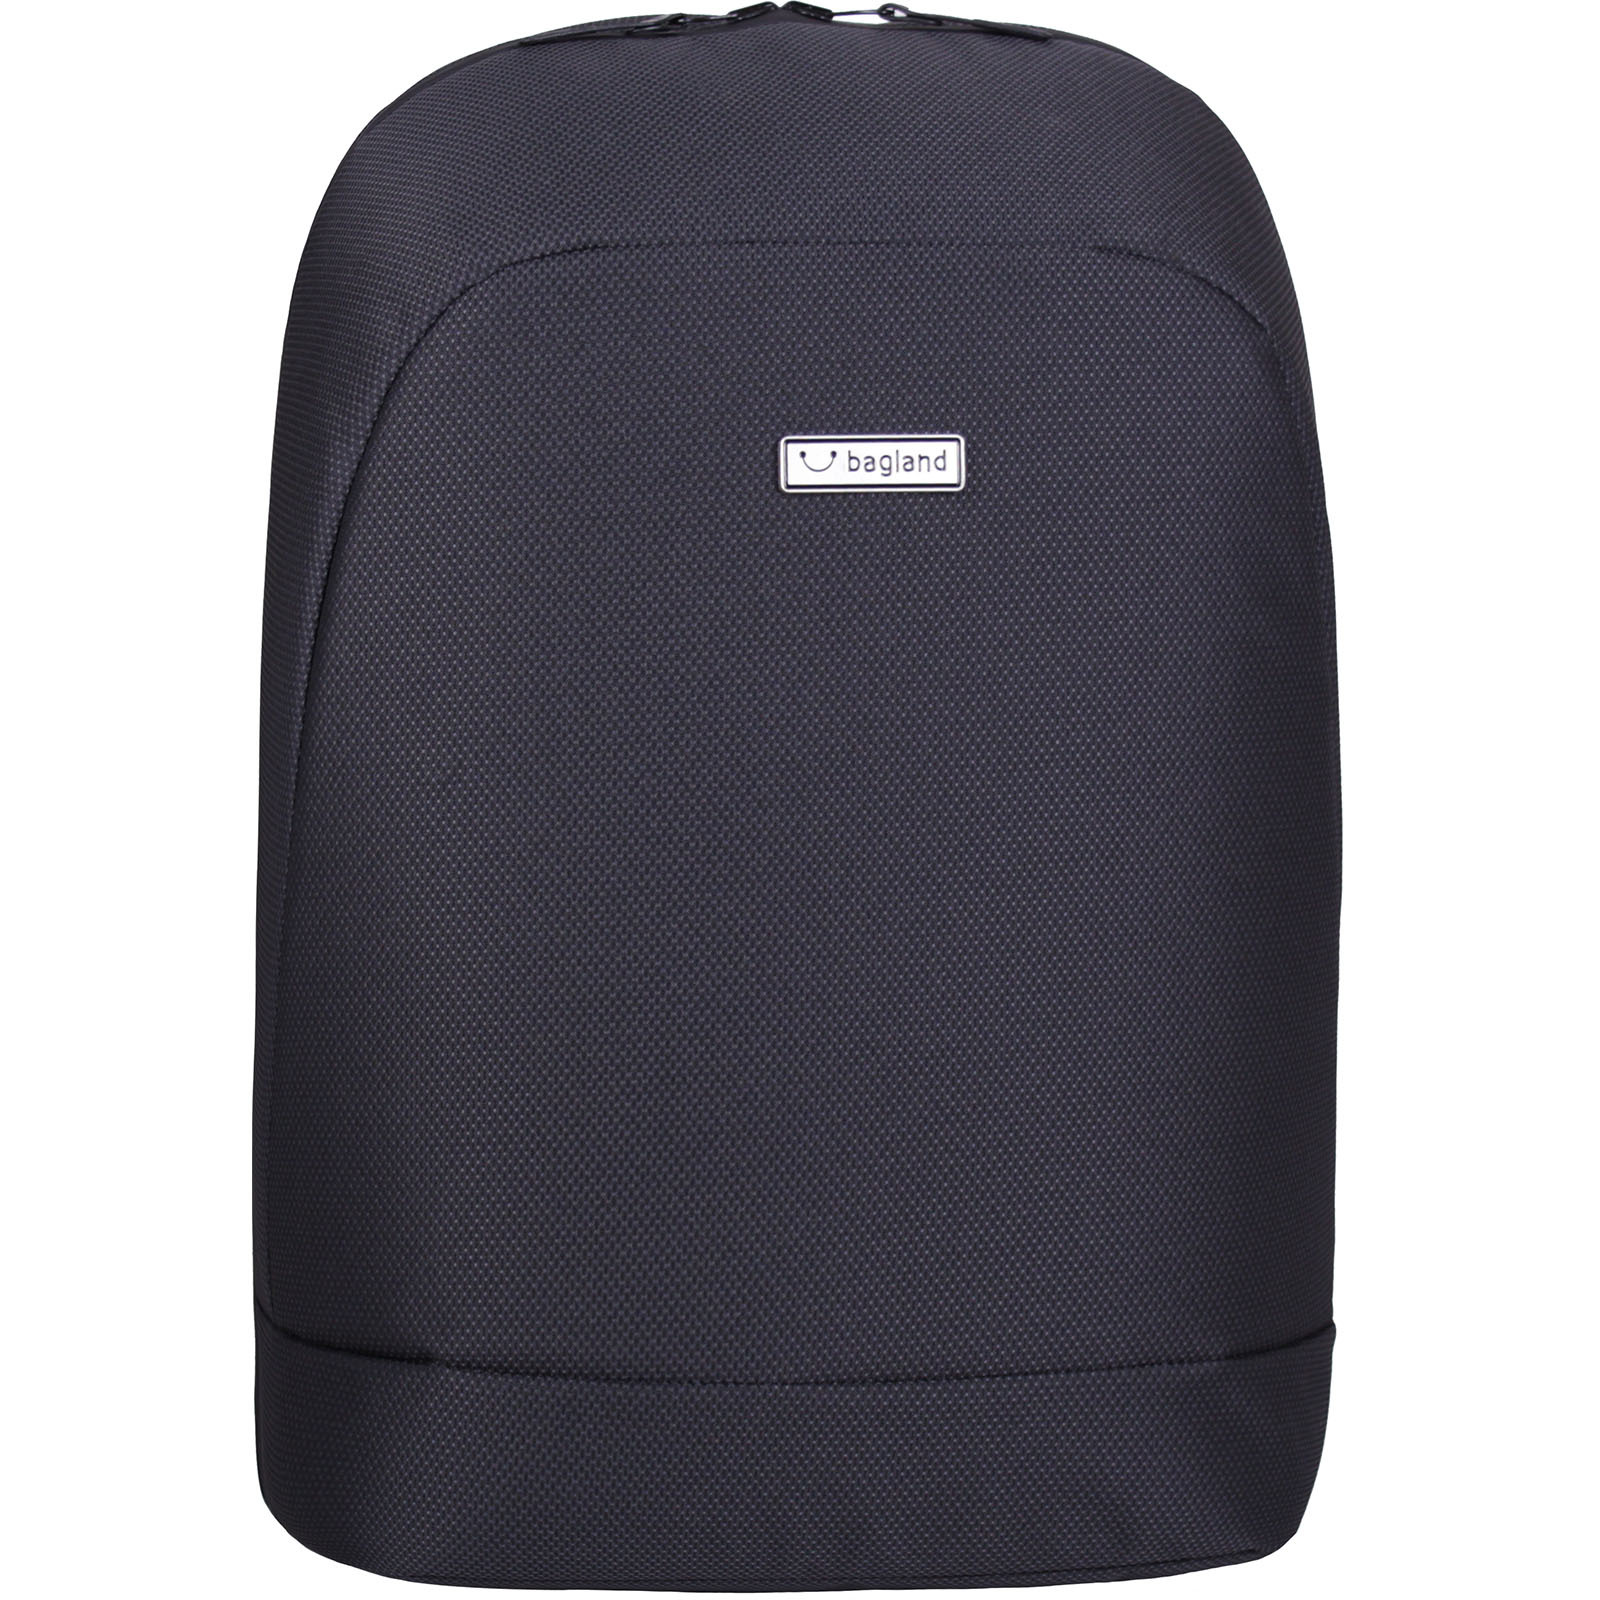 Рюкзаки для ноутбука Рюкзак для ноутбука Bagland Advantage 23 л. Чёрный (00135169) IMG_3131.JPG